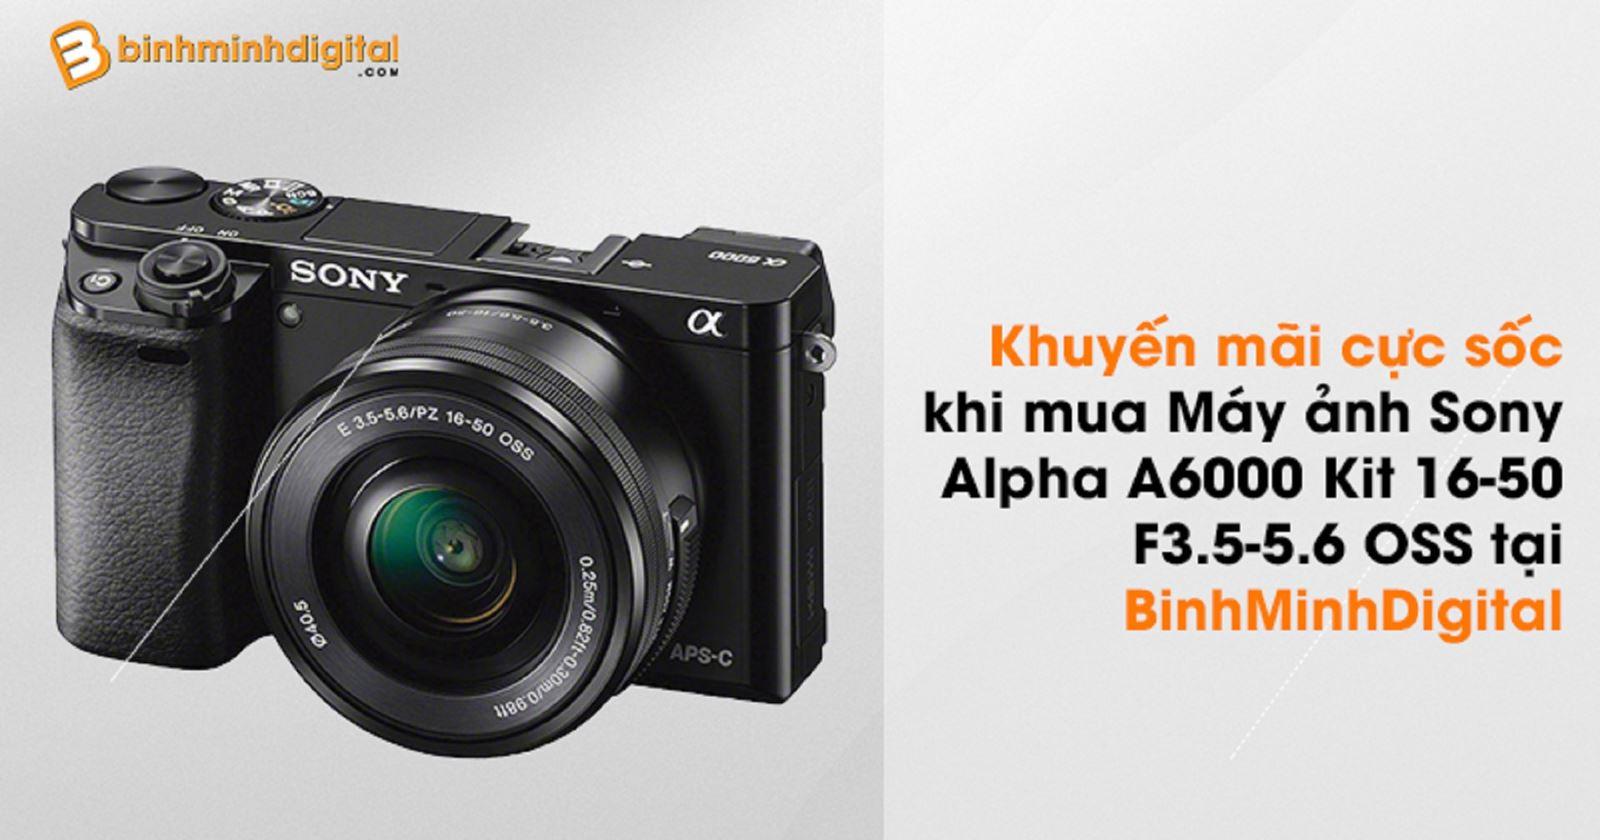 Khuyến mãi cực sốc khi mua Máy ảnh Sony Alpha A6000 (ILCE-6000L) Kit16-50 F3.5-5.6 OSS tại BinhMinhDigital